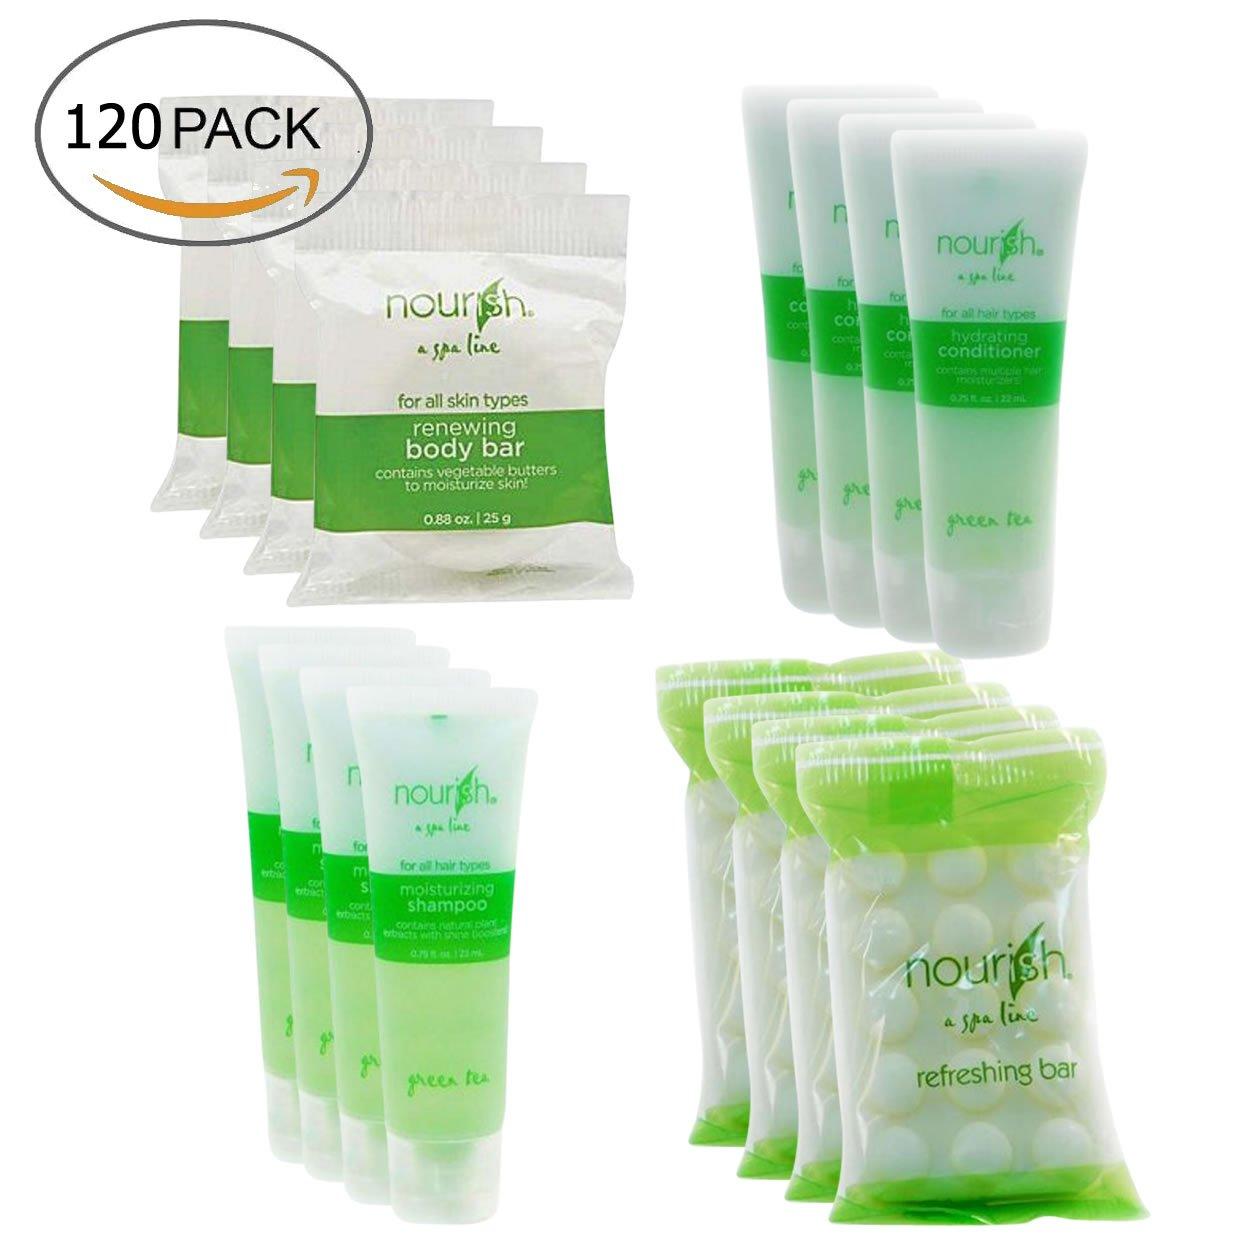 Nourish Spa Line Green Tea BNB Amenity Bath & Body Sets - Soap, Shampoo, Conditioner (30 SET - 120 Pieces Total)